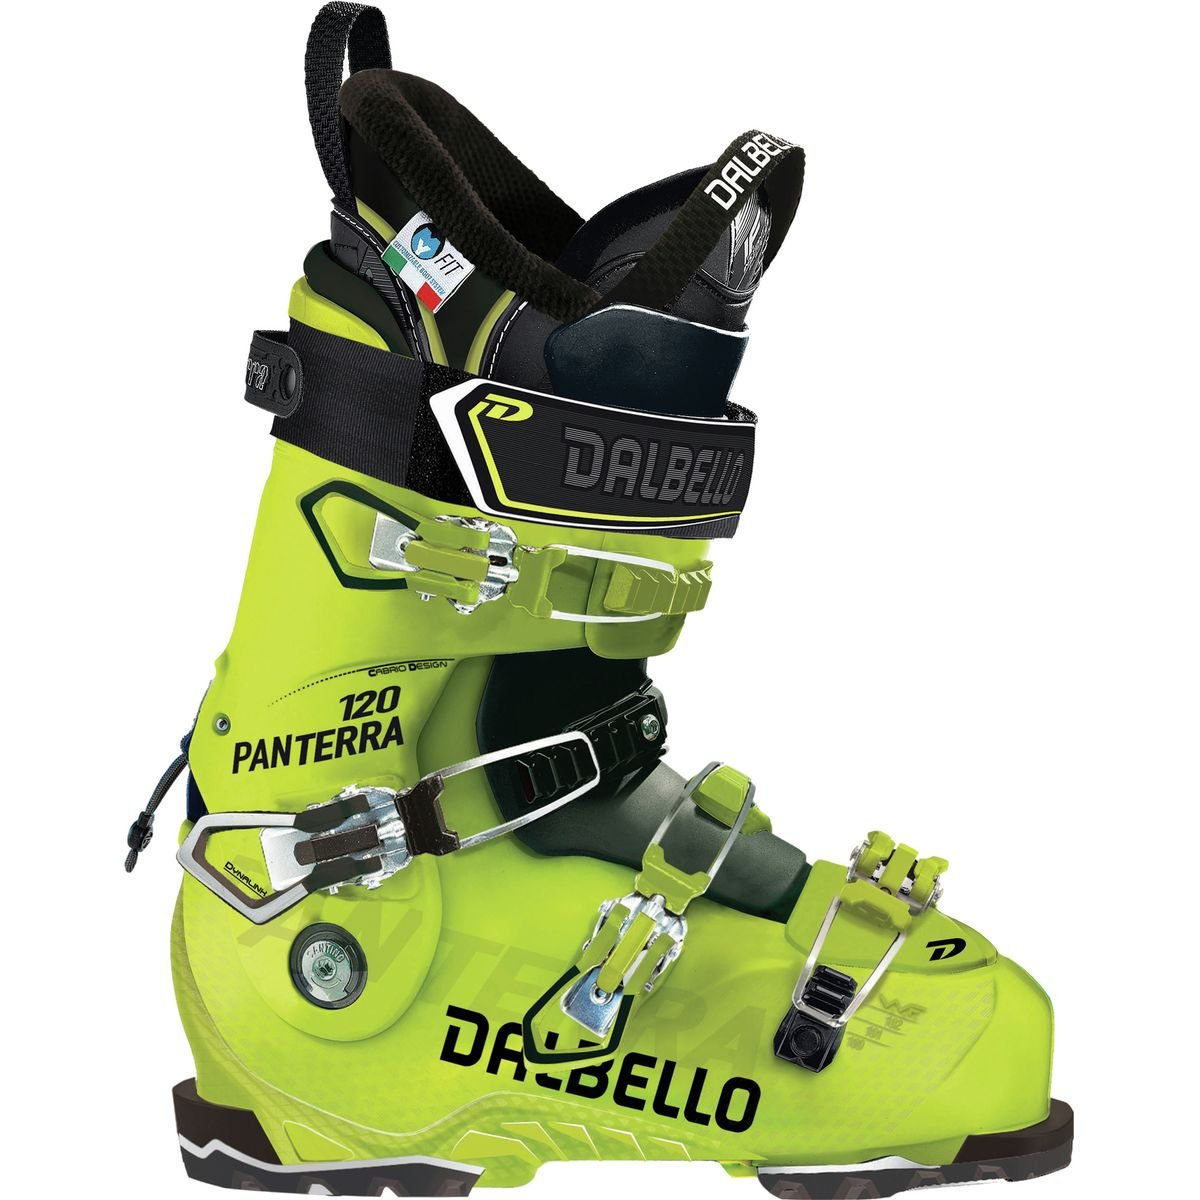 Dalbello Sports Panterra 120 I.D. Ski Boot Acid Yellow/Black, 25.5 by Dalbello Sports